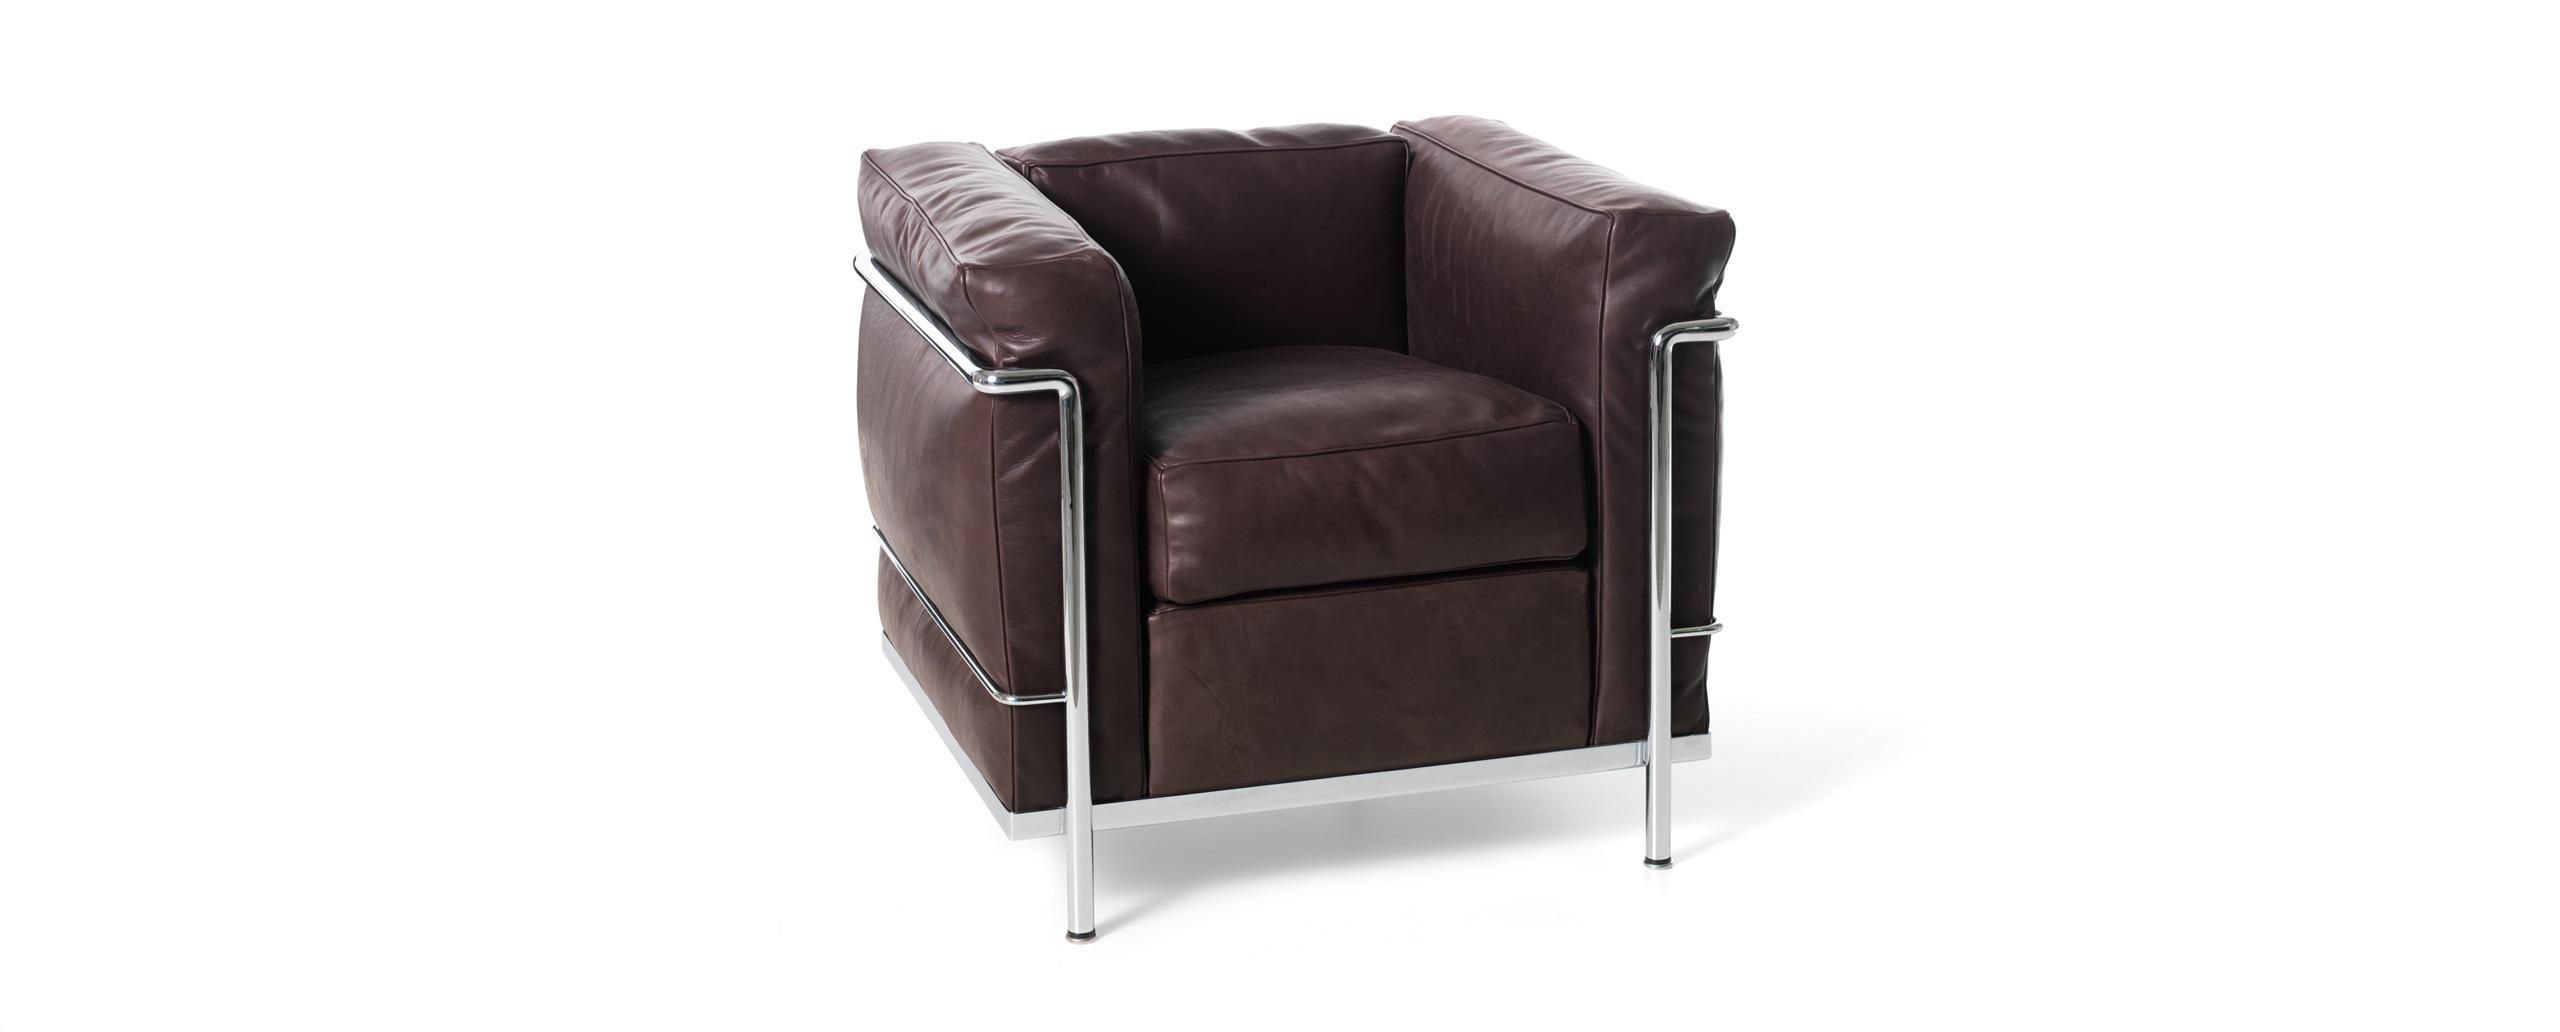 designwebstore lc2 schwarz matt lackiert canvas 13e158. Black Bedroom Furniture Sets. Home Design Ideas